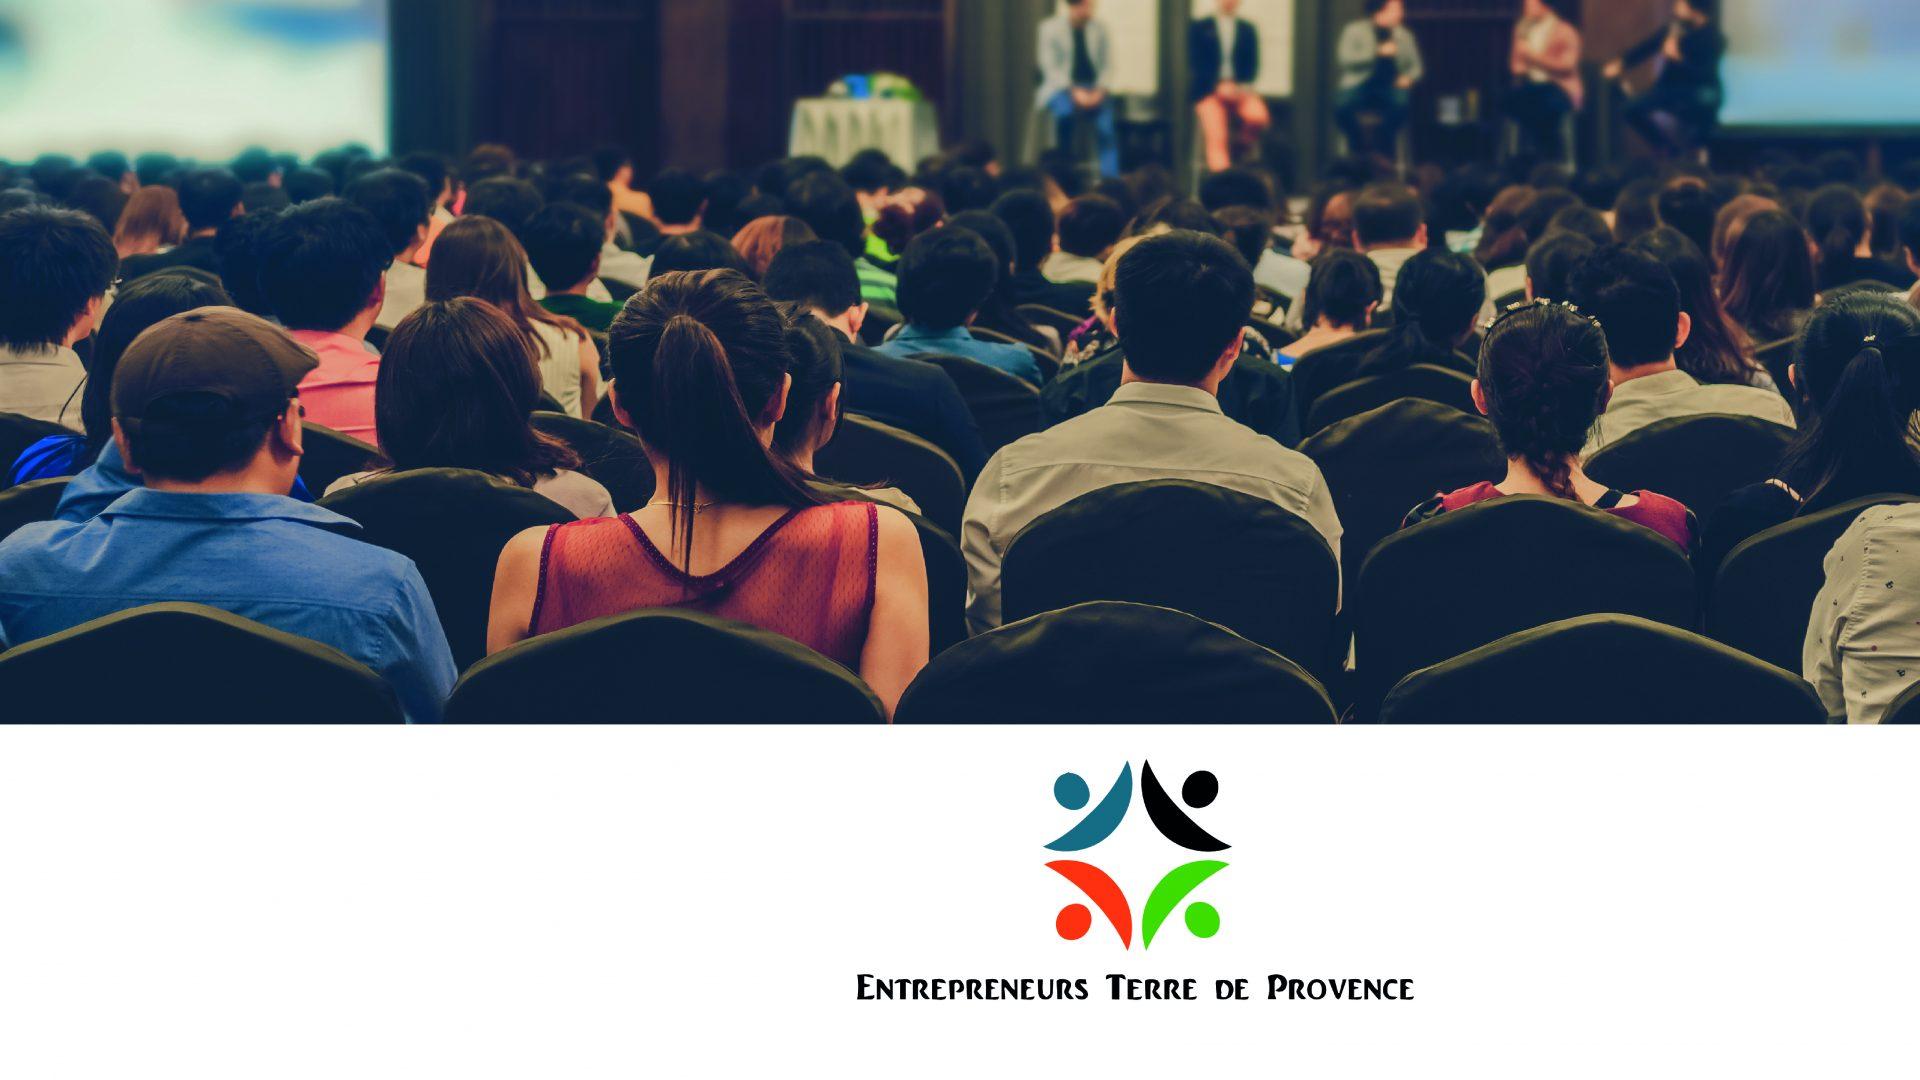 Entrepreneurs terre de Provence